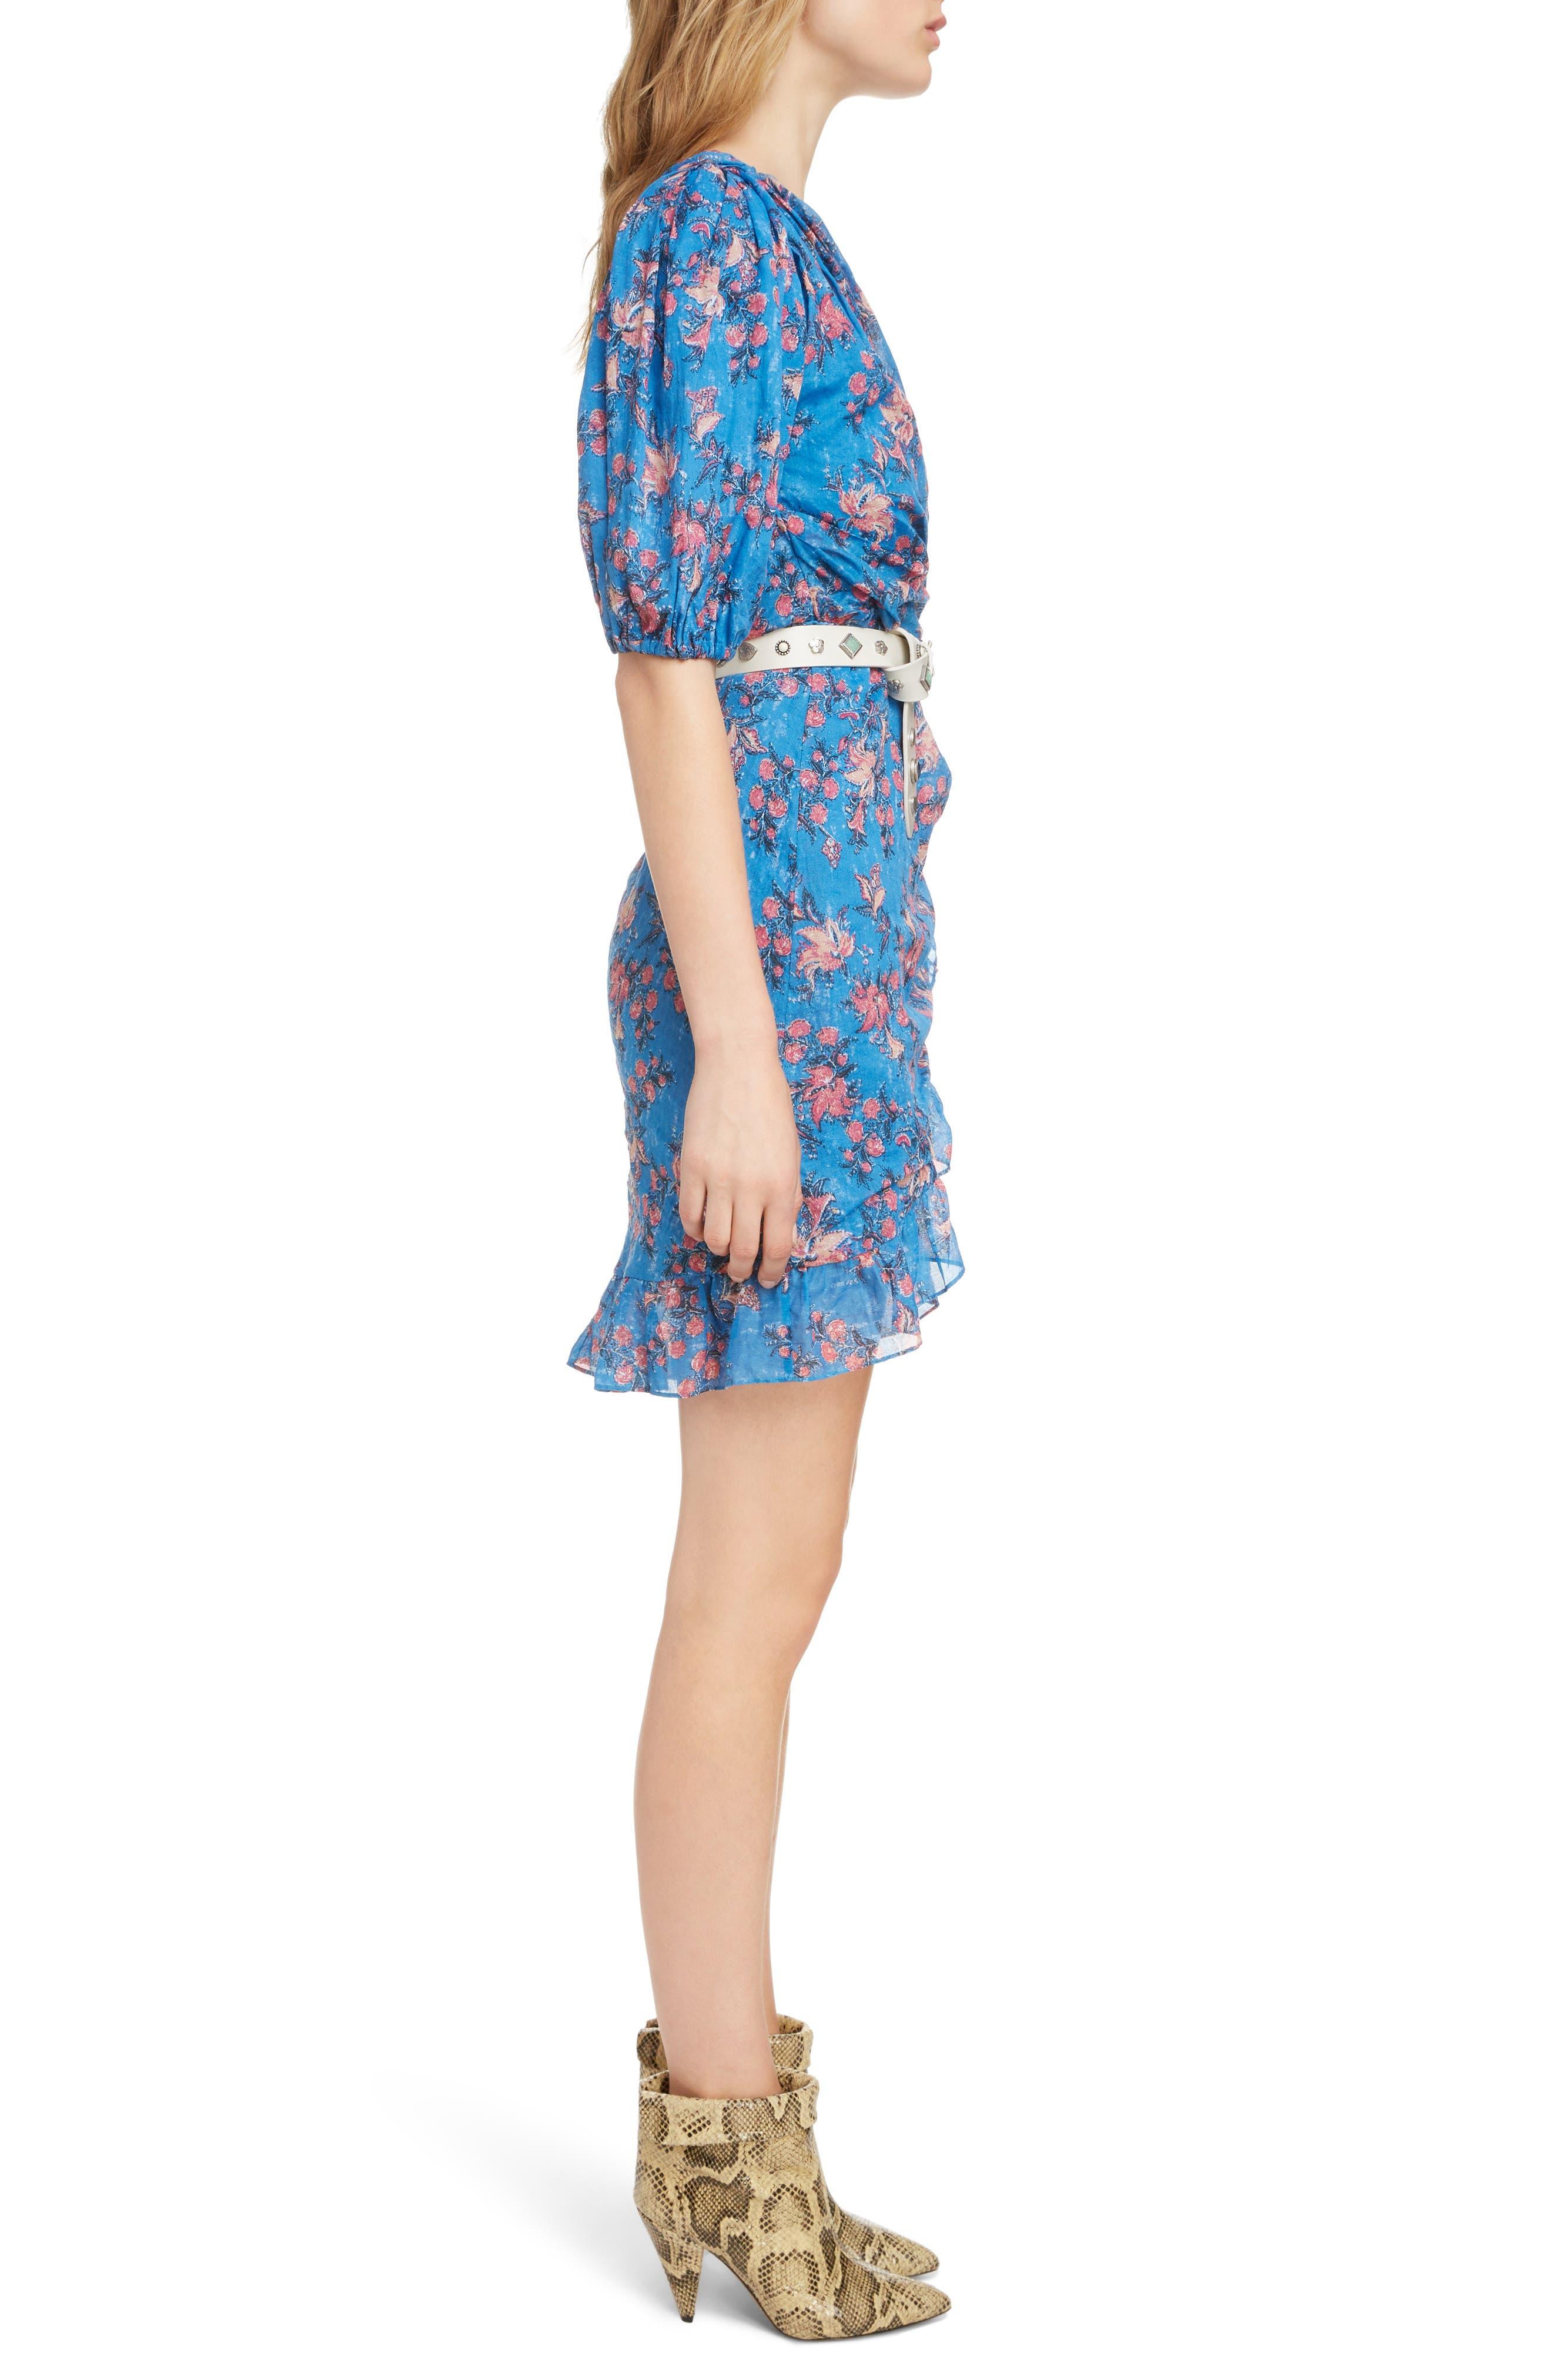 ISABEL MARANT ÉTOILE,                             Esther One-Shoulder Dress,                             Alternate thumbnail 3, color,                             BLUE